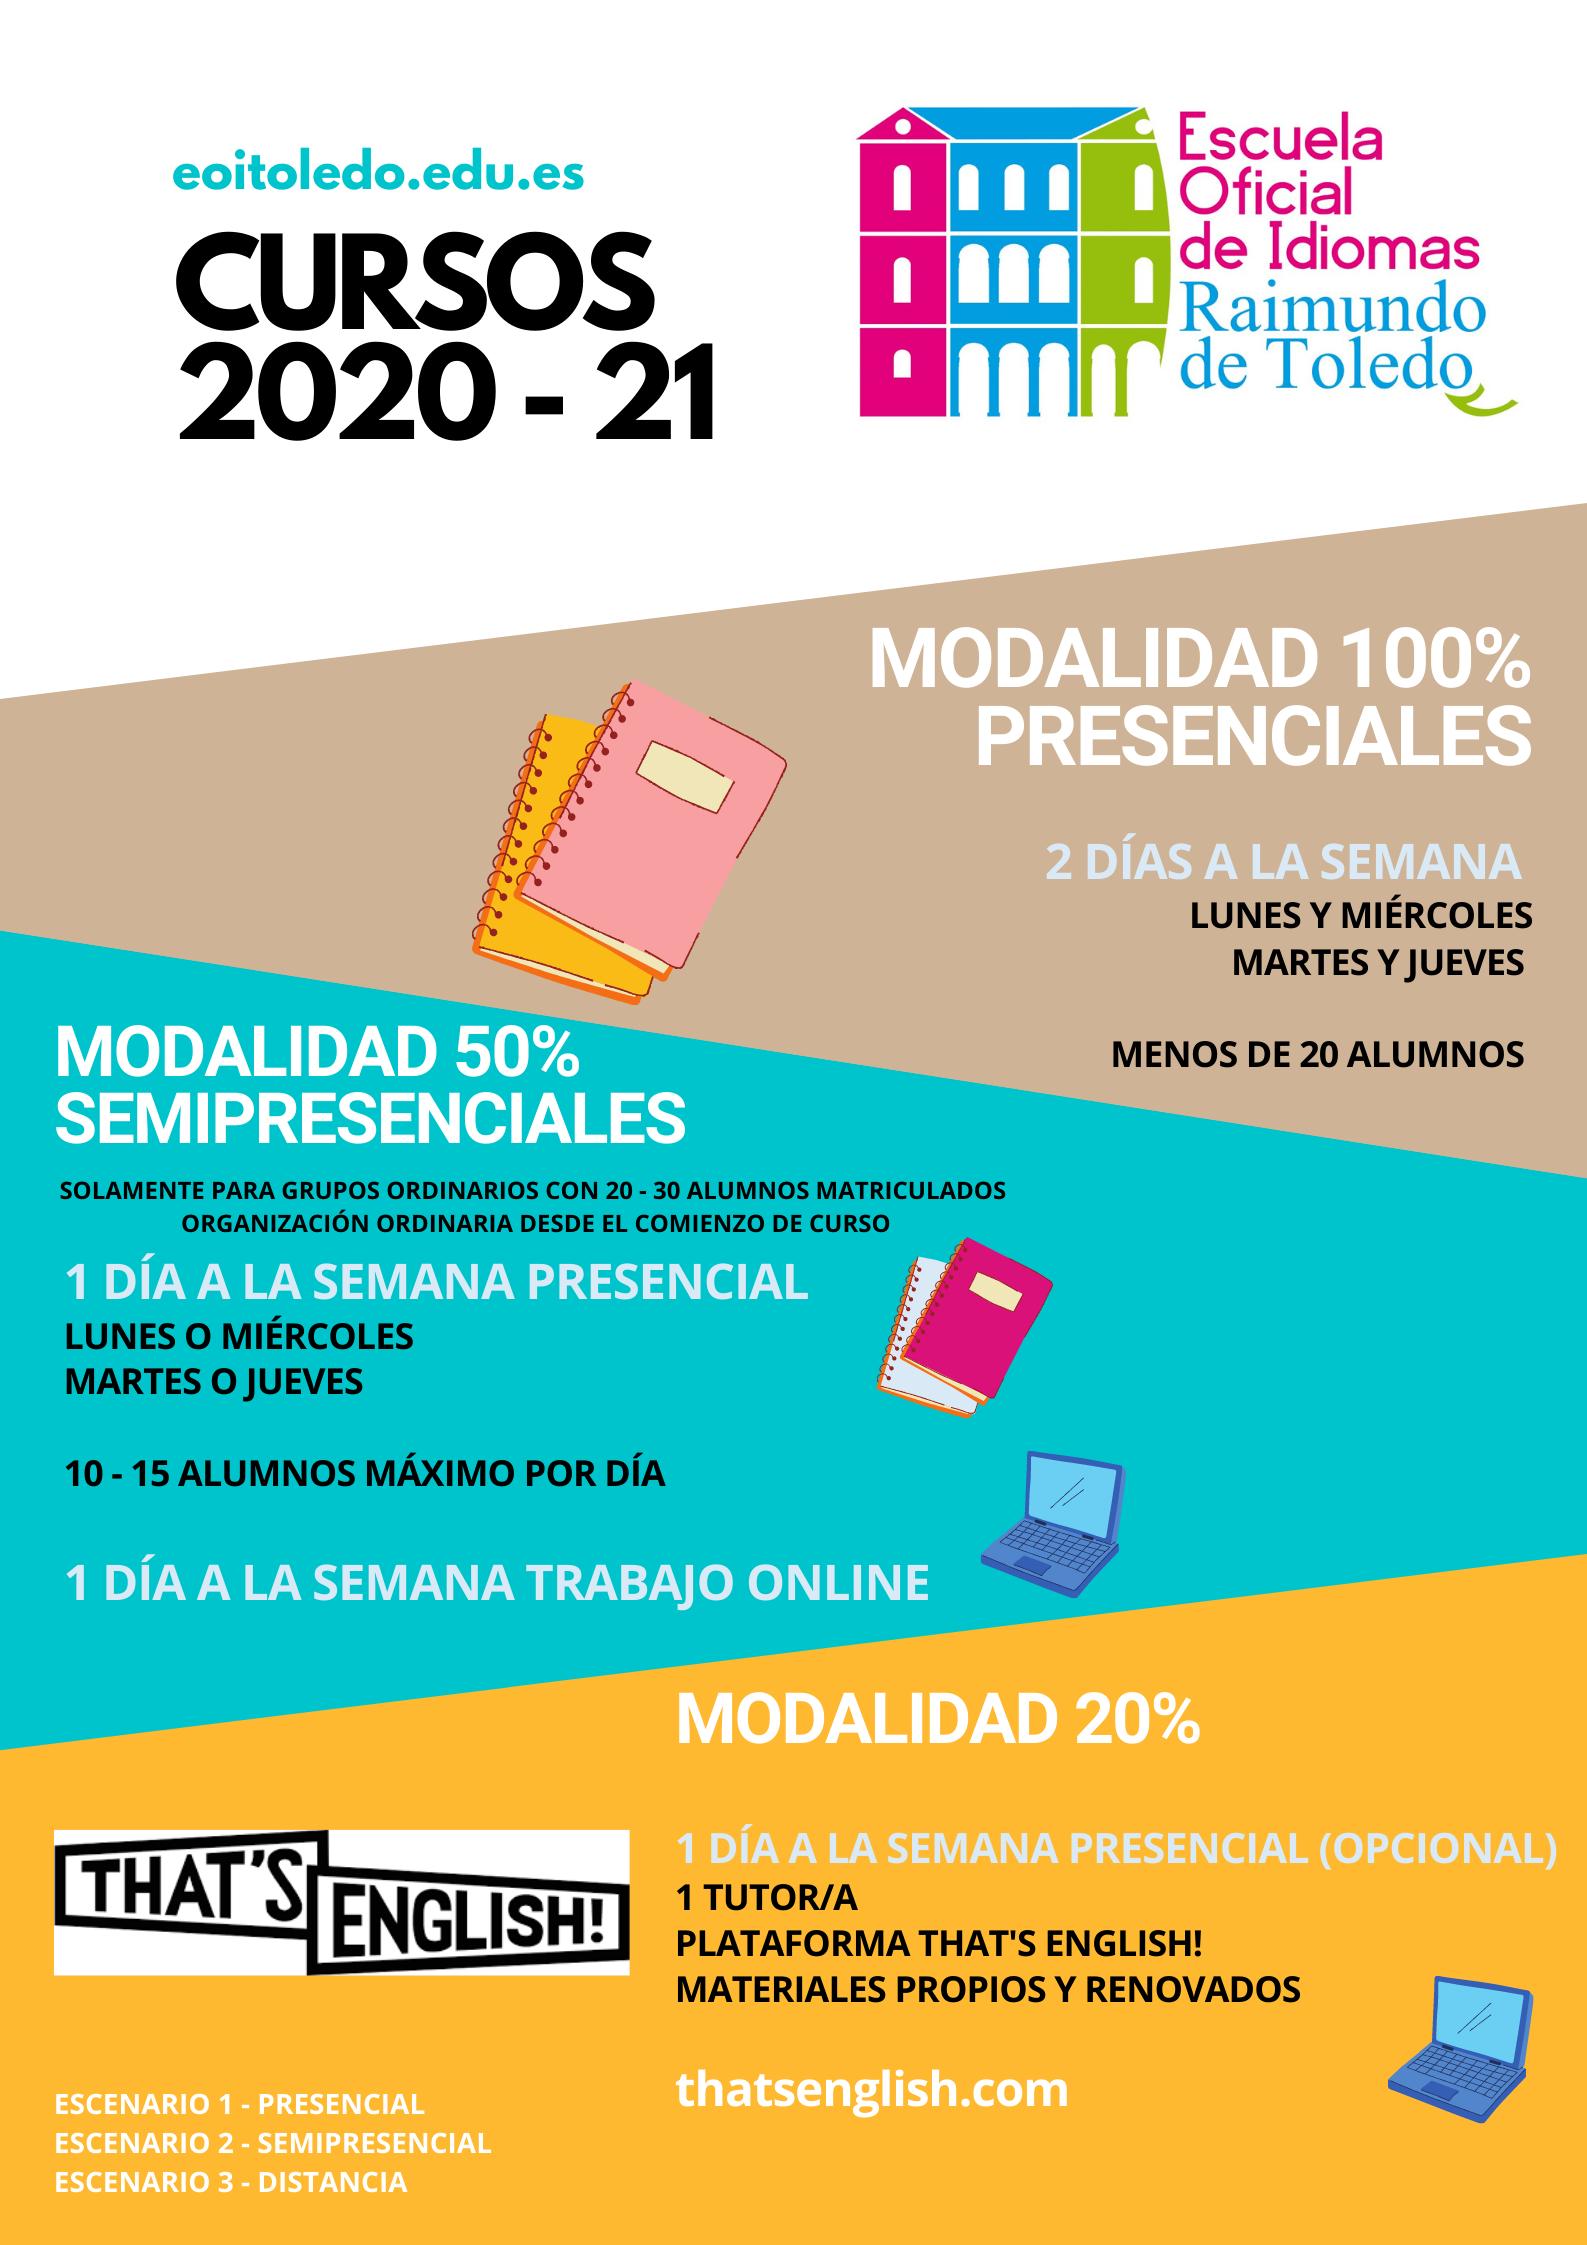 StopTheSpread 1 - Comienzo del curso escolar 2020 - 21